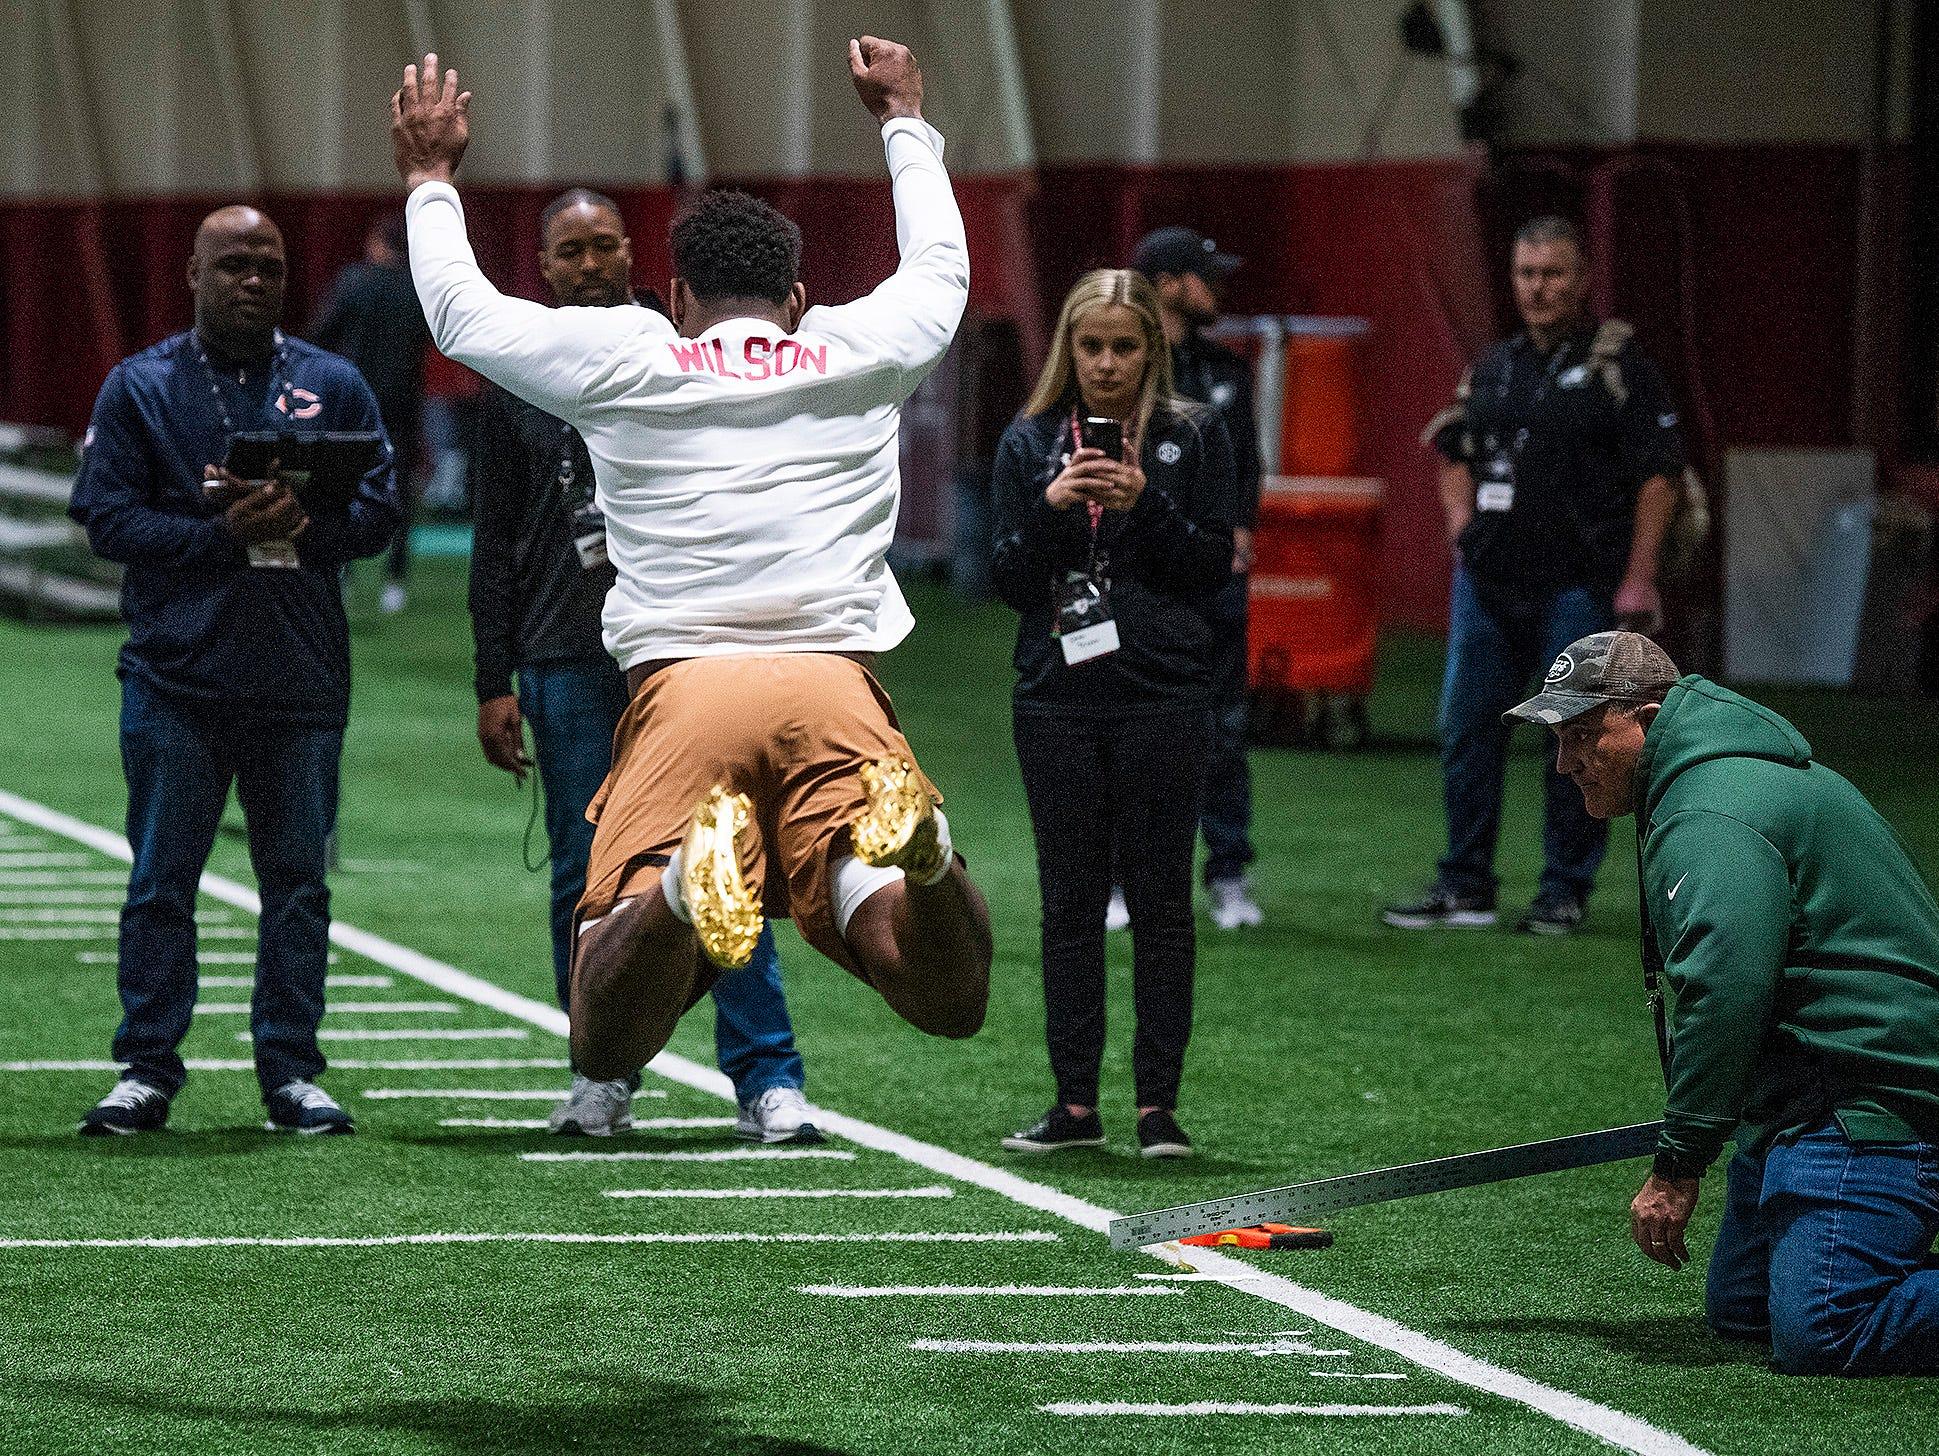 Alabama linebacker Mack Wilson leaps during Pro Day on the University of Alabama campus in Tuscaloosa, Ala., on Tuesday March 19, 2019.